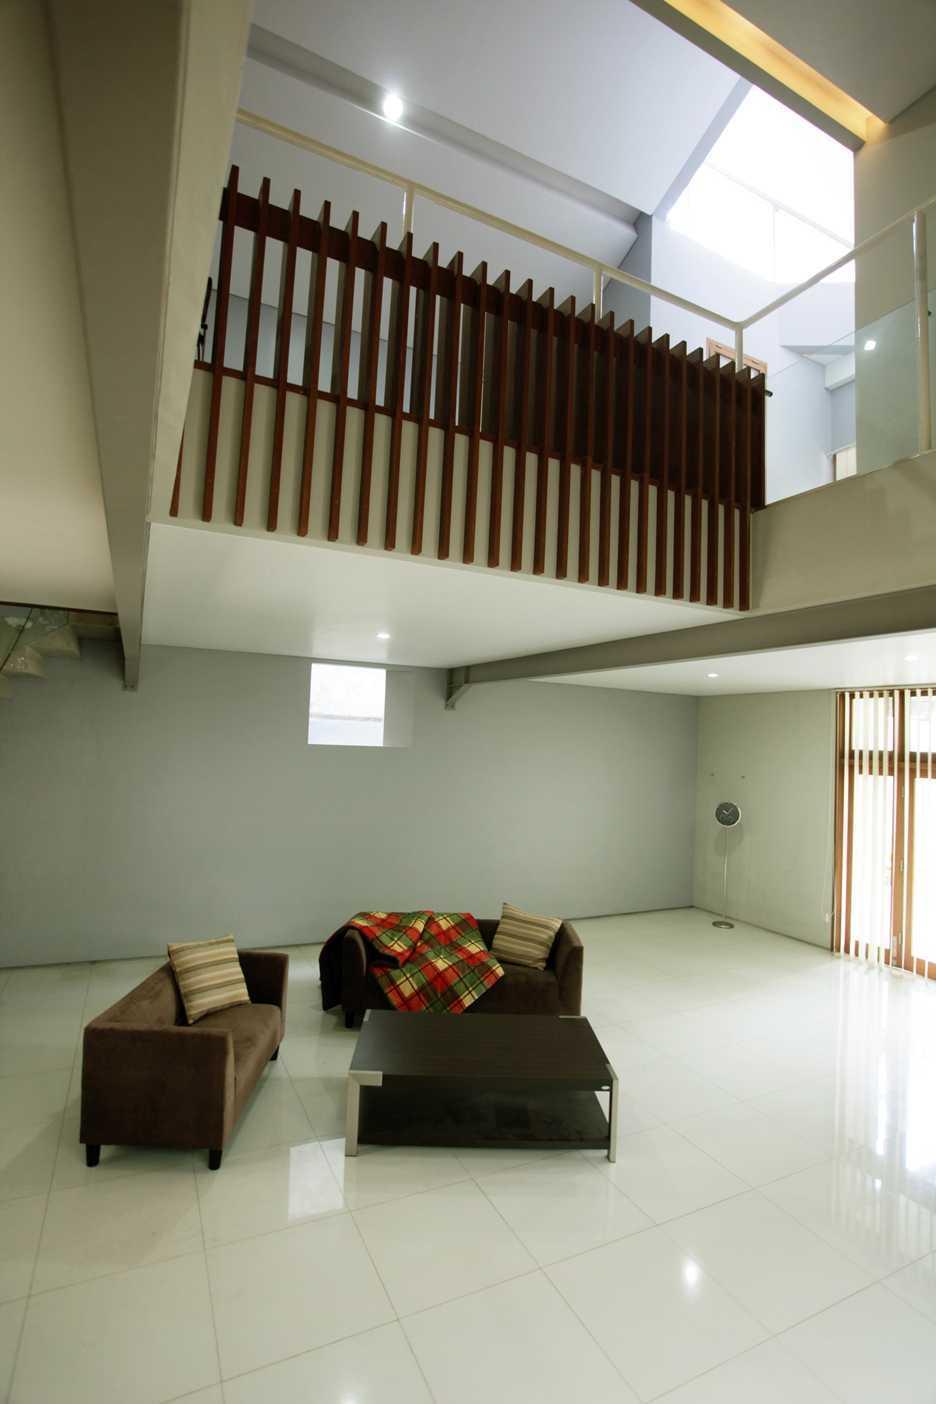 Armeyn Ilyas Doctor House Kelapa Dua Wetan, Ciracas, East Jakarta City, Jakarta, Indonesia Jakarta Livingroom Modern  17739